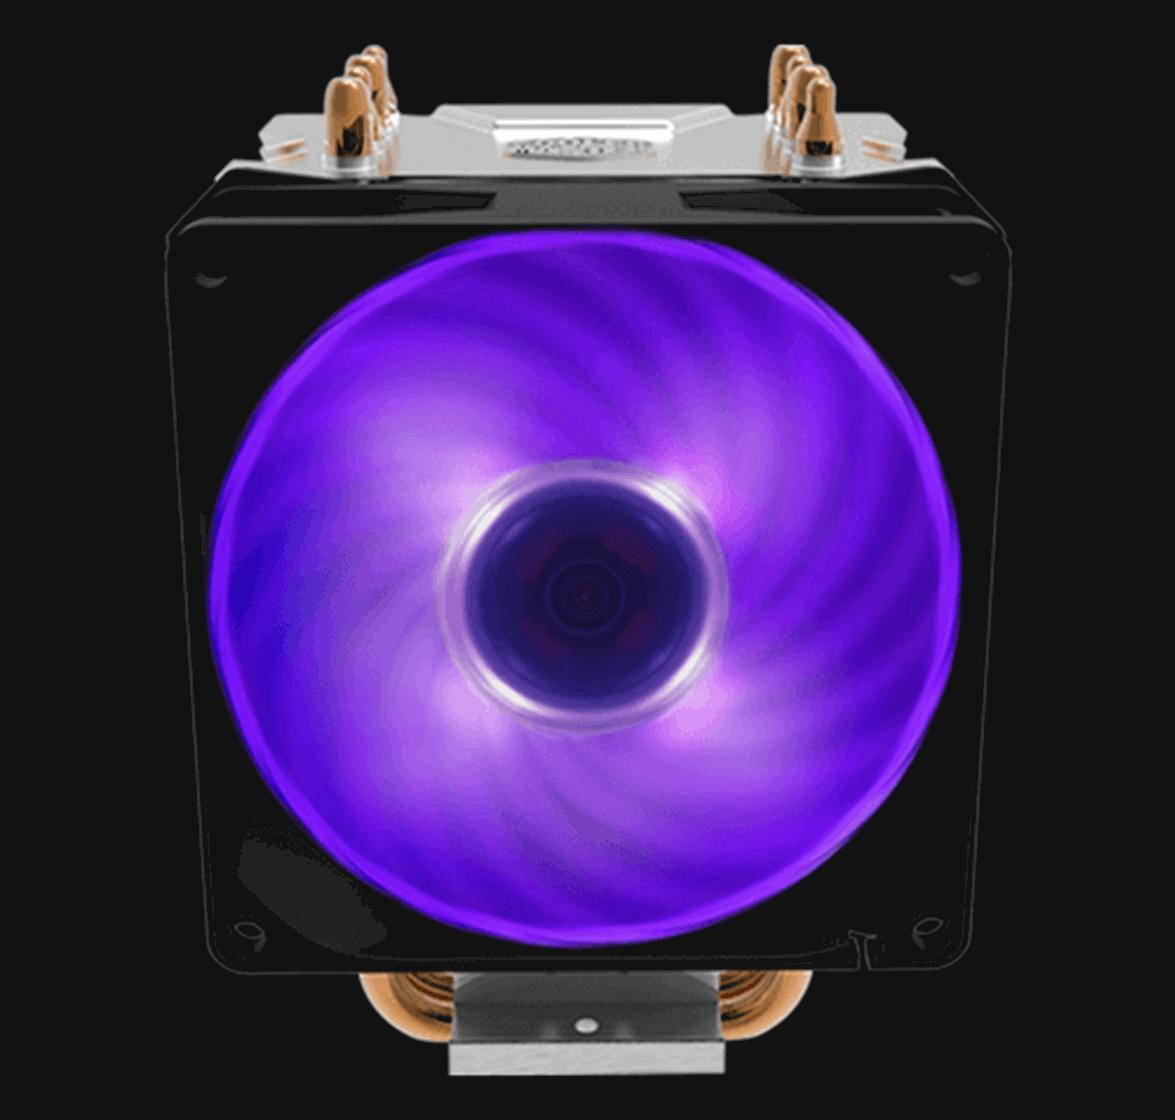 92mm PWM Fan With RGB Lighting